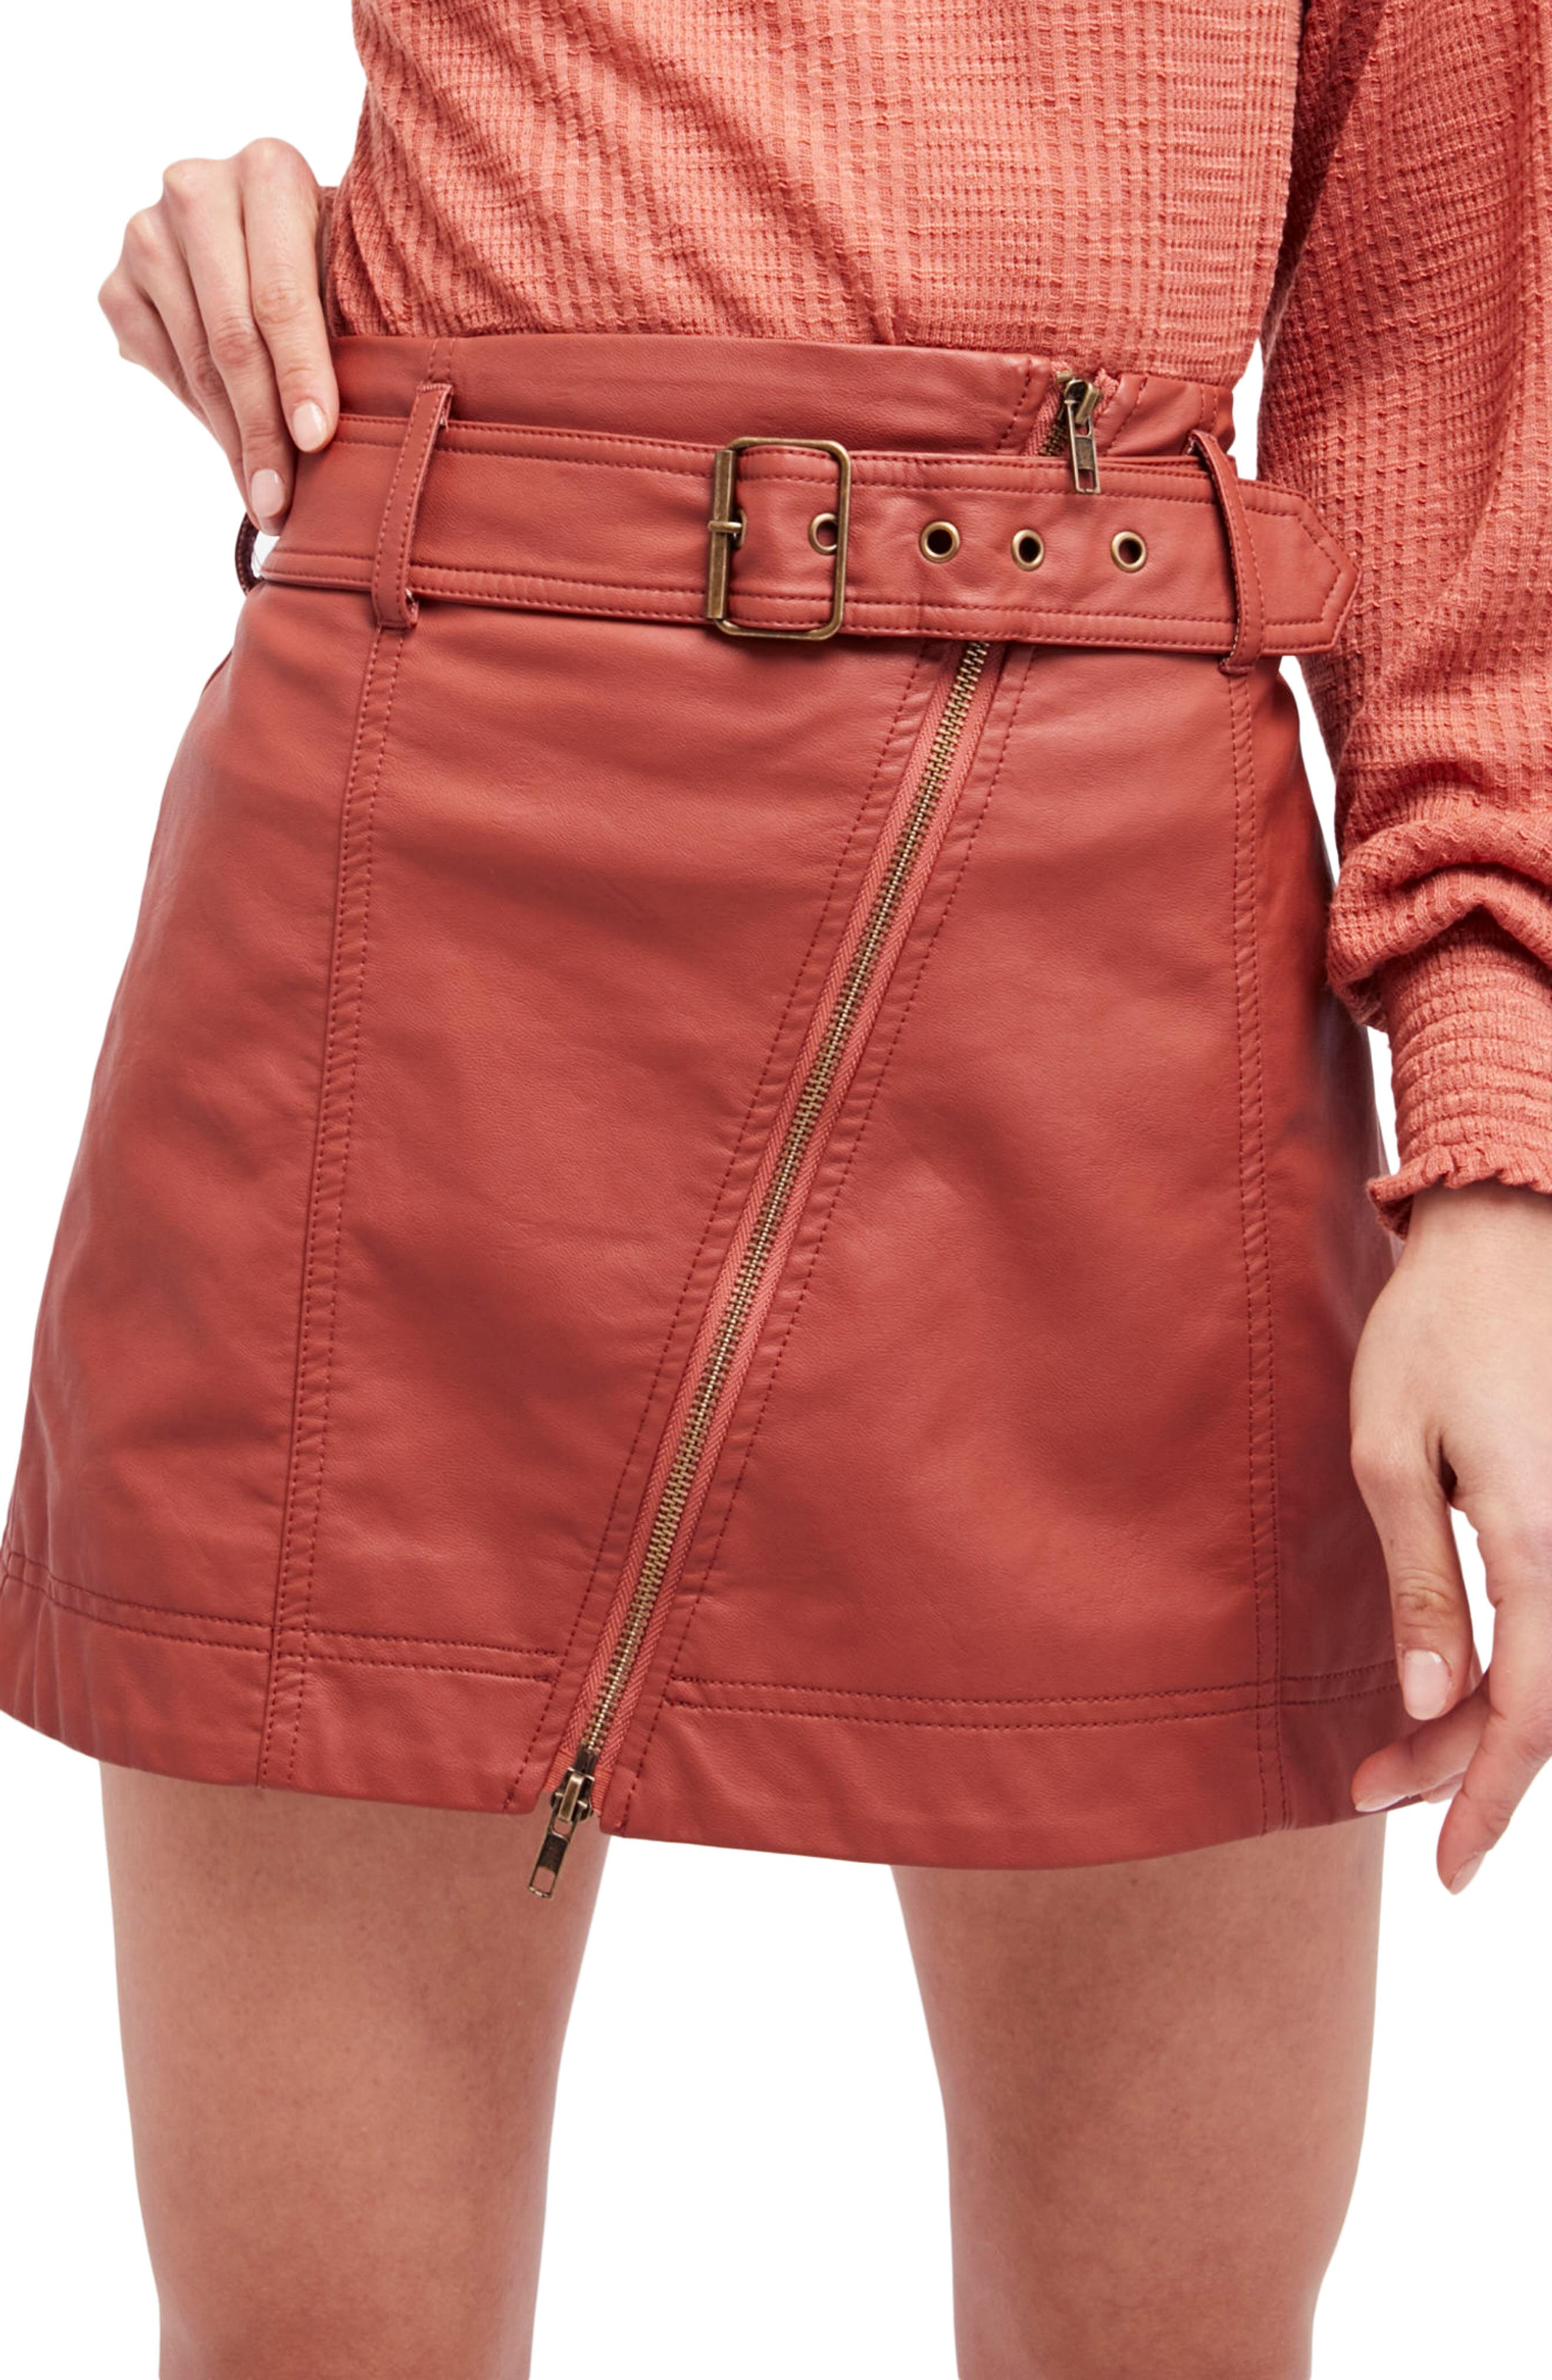 Free People Feelin' Fresh Faux Leather Moto Skirt